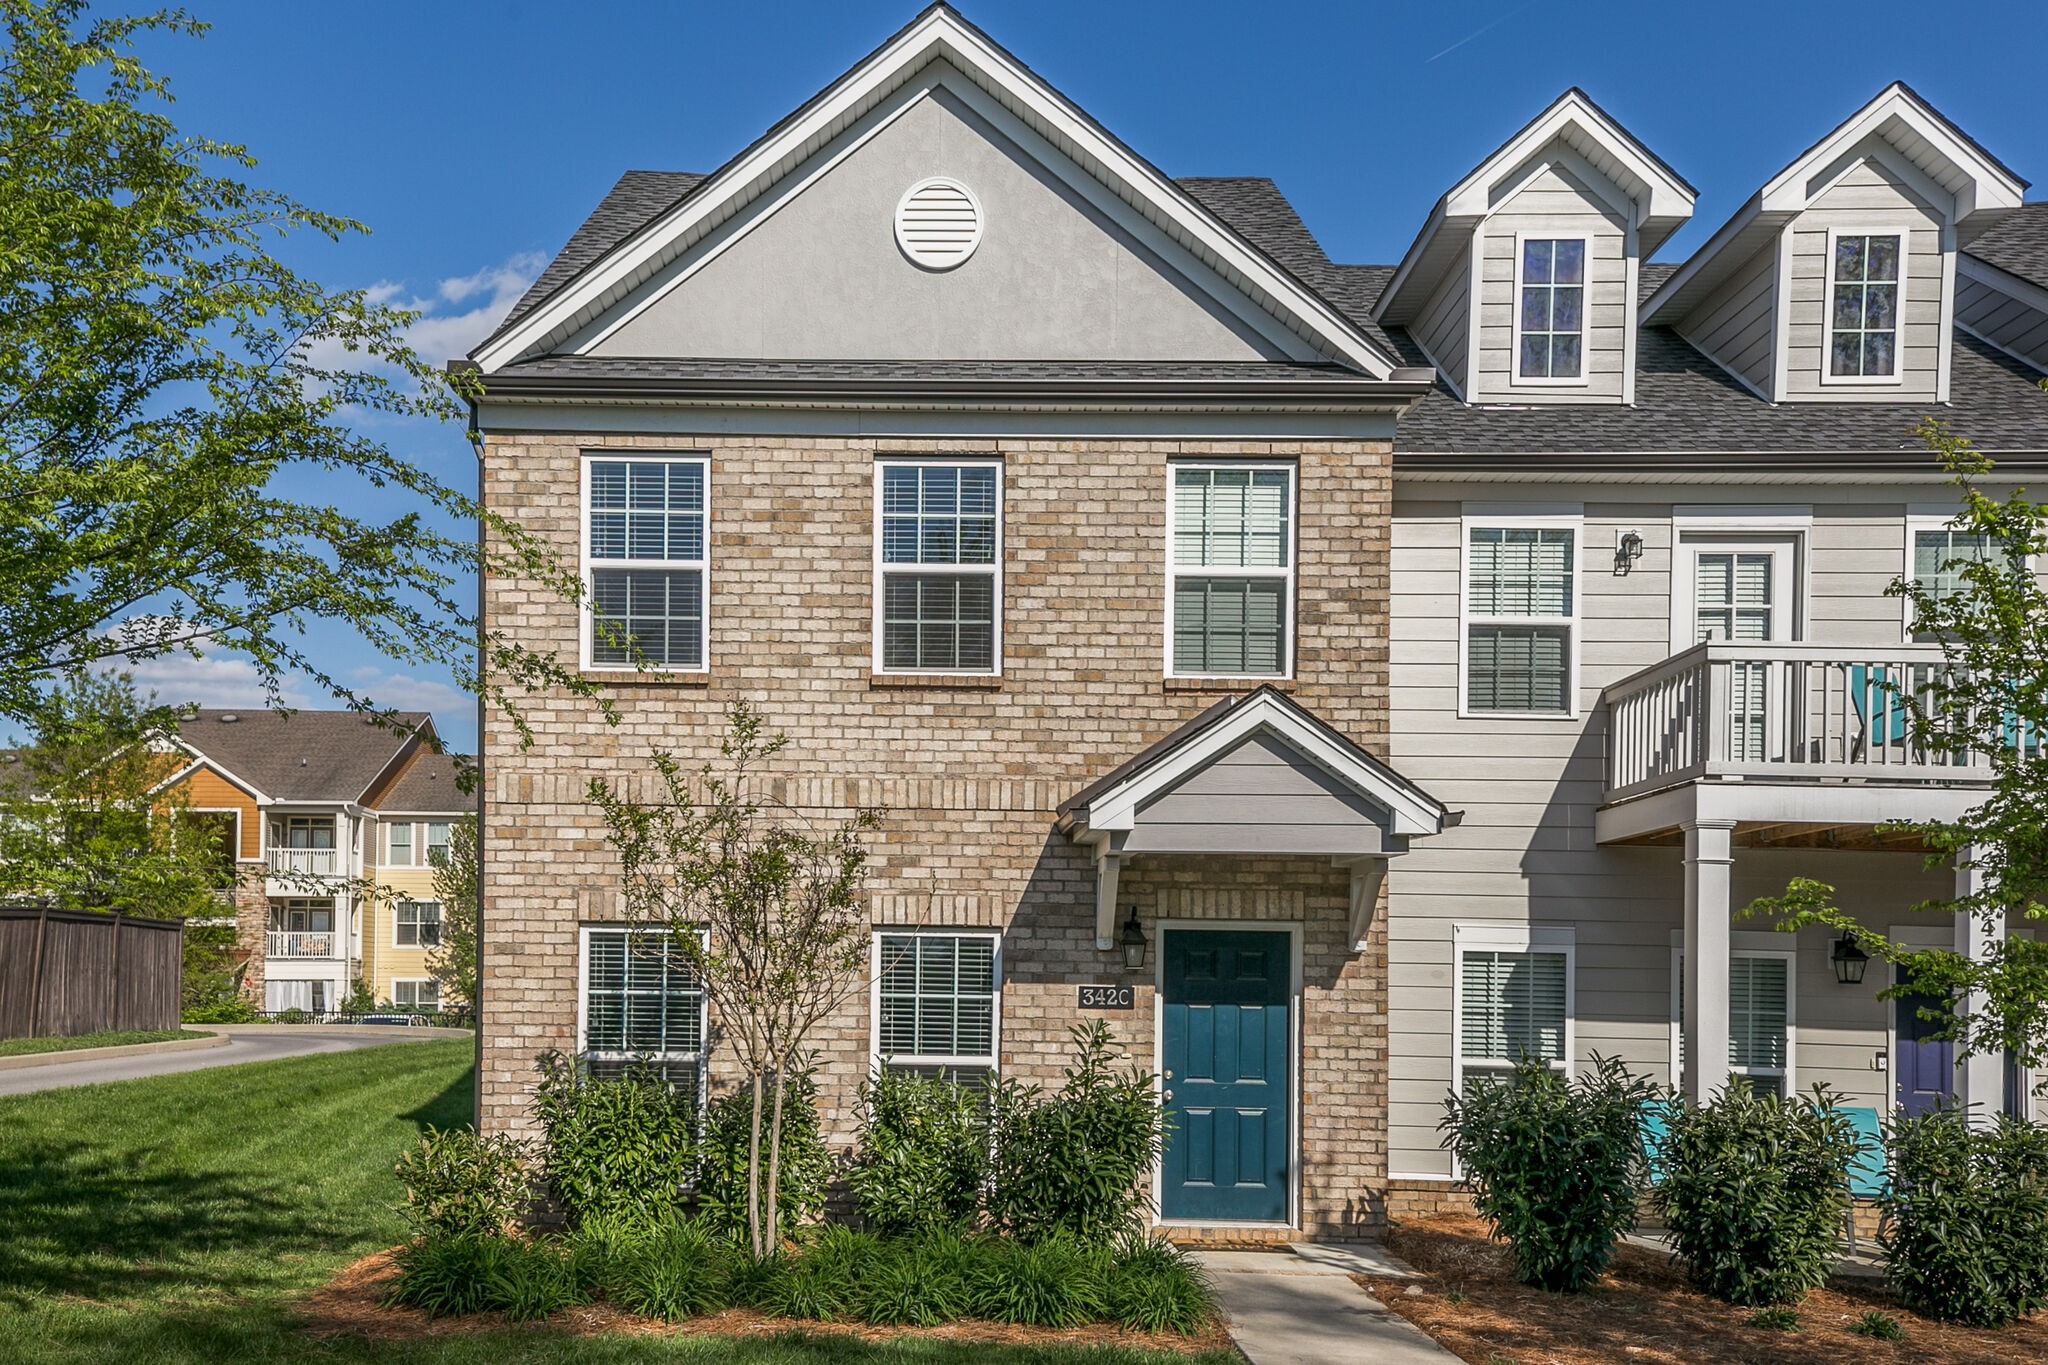 342 Lakeside Park Dr #C Property Photo - Hendersonville, TN real estate listing